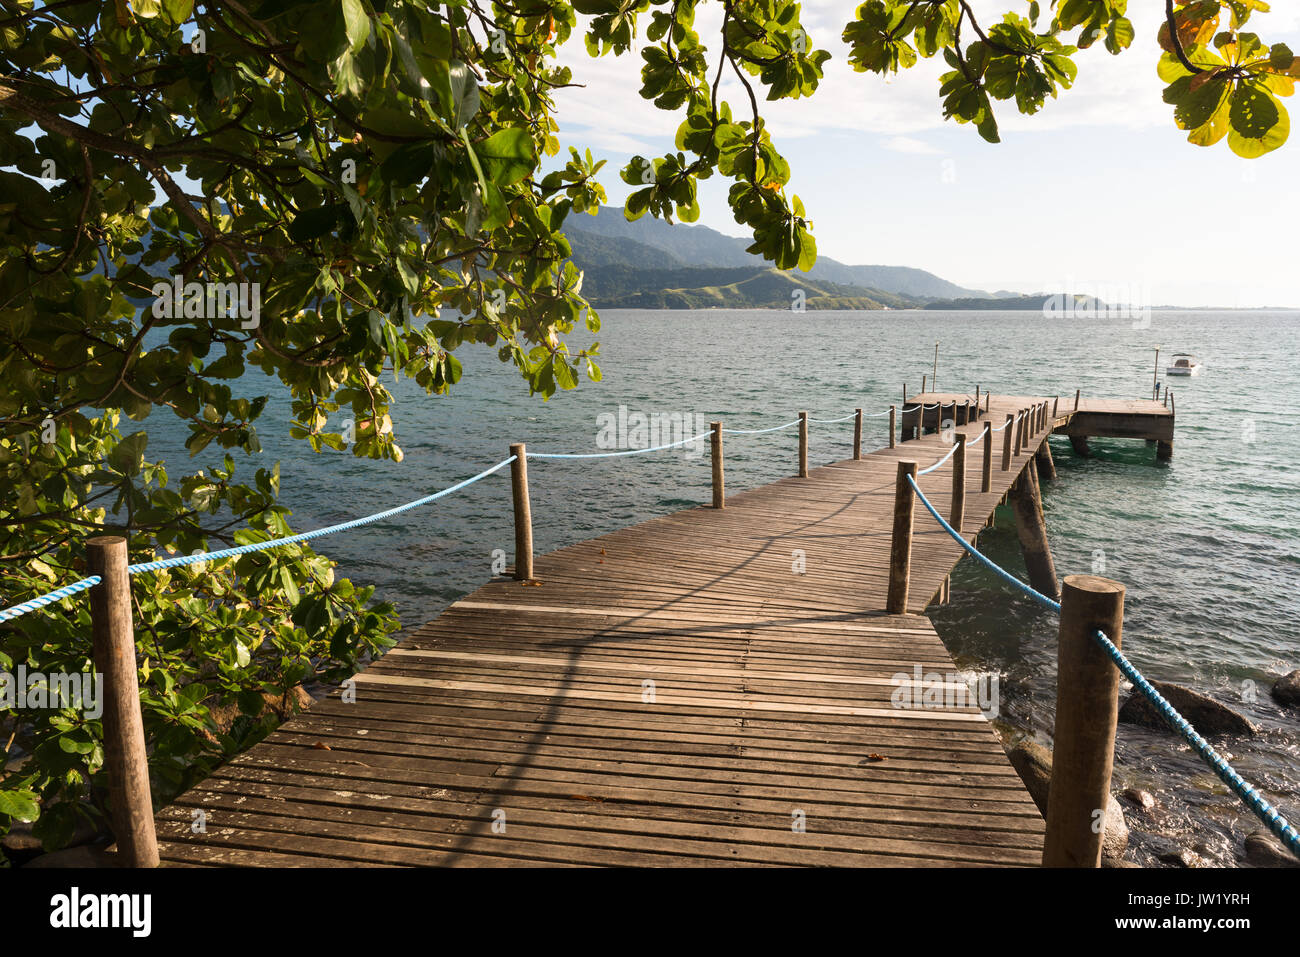 A wooden pier in Ilhabela, Brazil Stock Photo